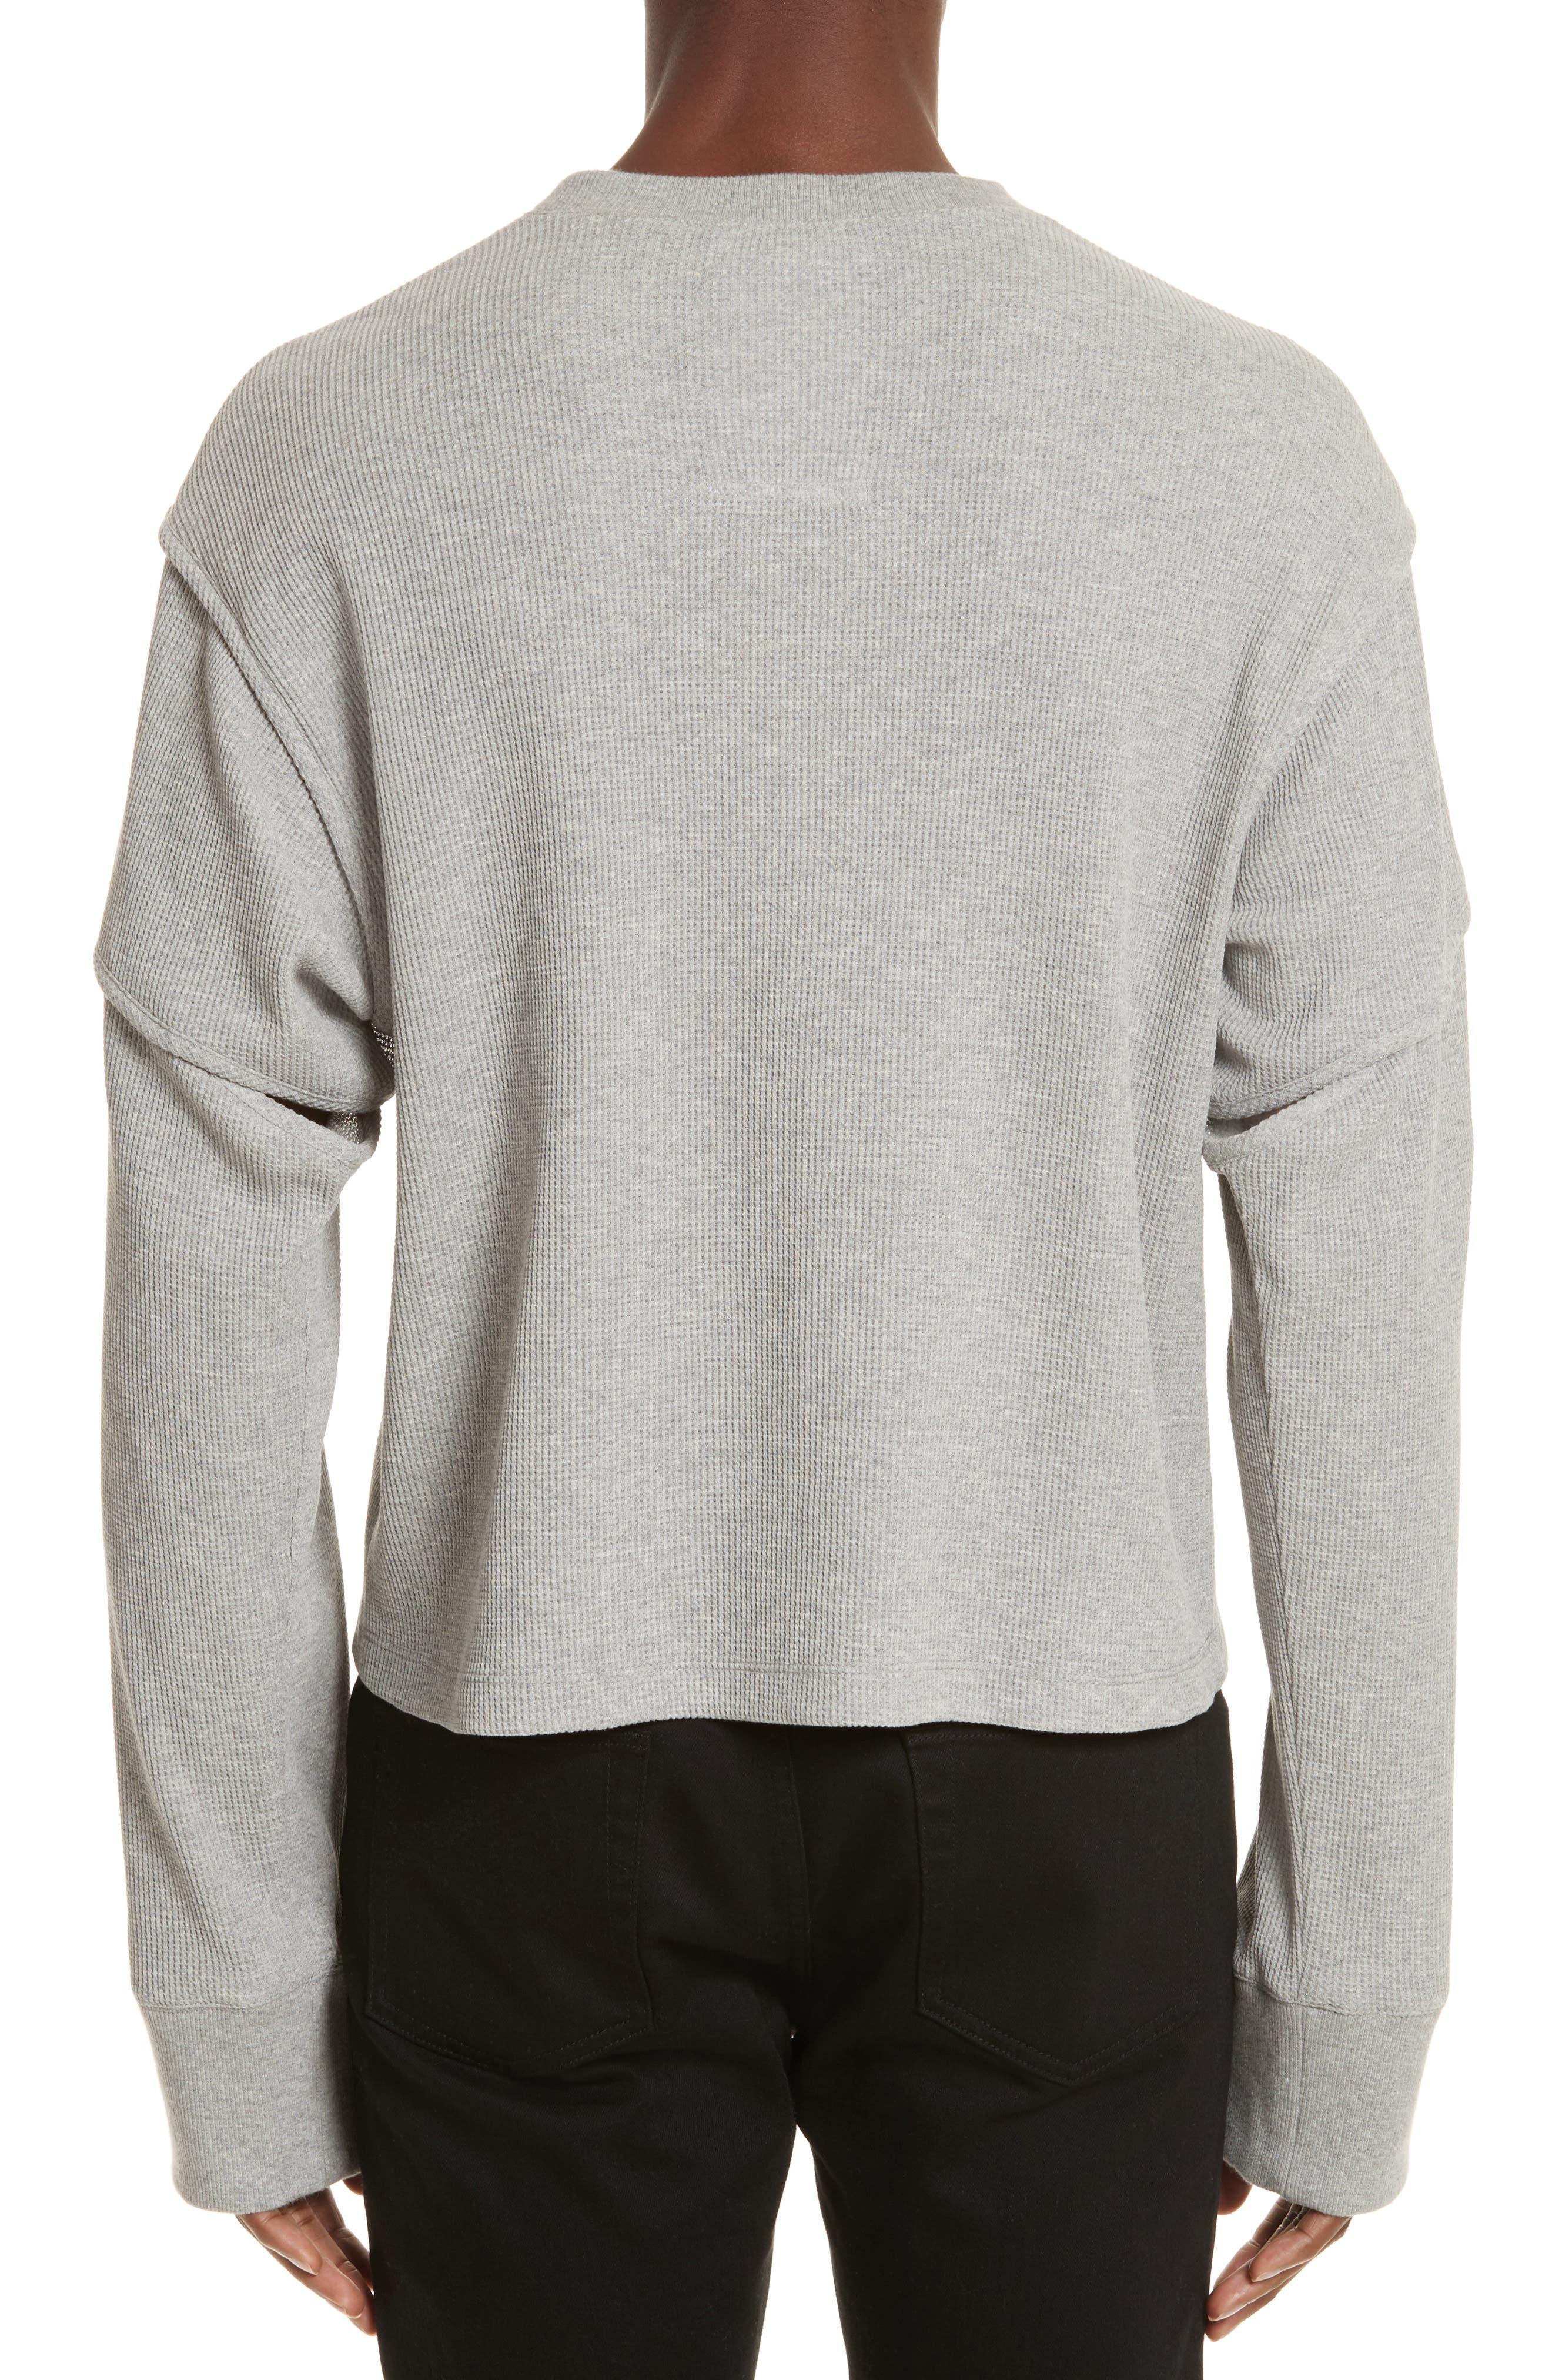 Military Panel Sleeve Thermal Shirt,                             Alternate thumbnail 2, color,                             Grey Melange